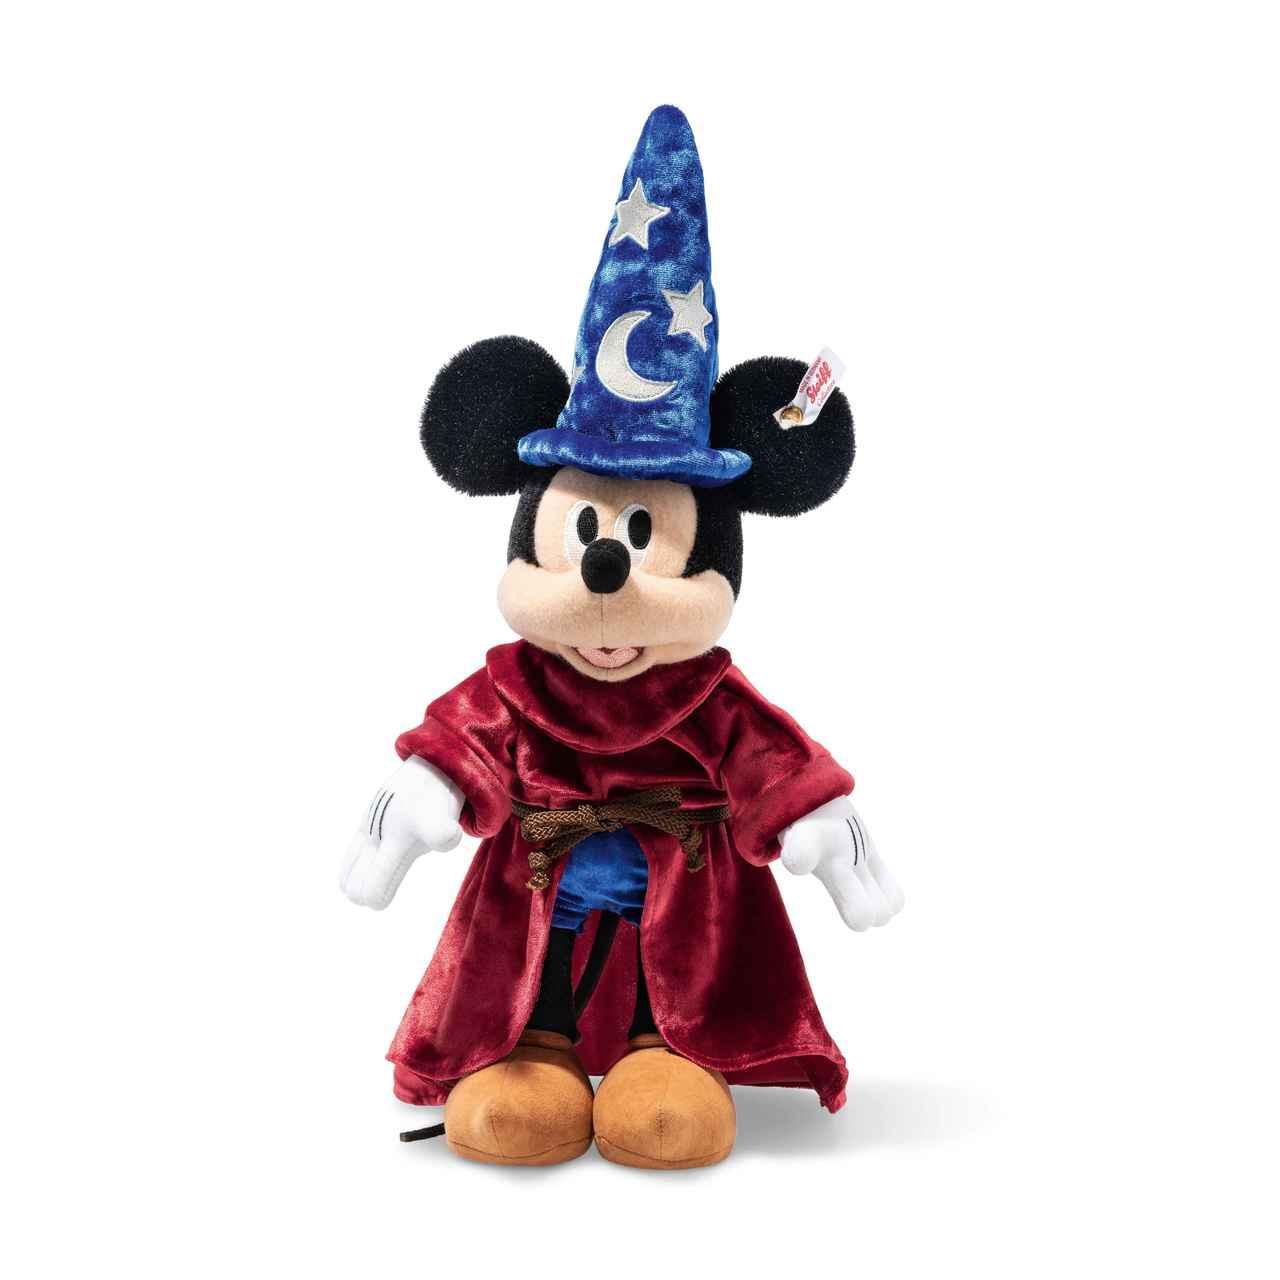 aa83a07db52c08 Disney Mickey Mouse Sorcerer Apprentice EAN 354397